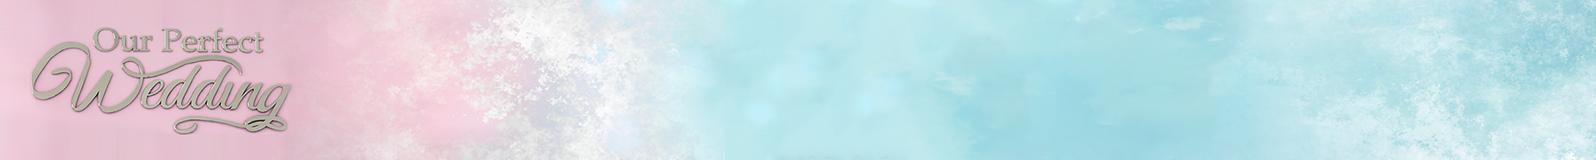 36 slim billboard desktop 1600x160 054 pre